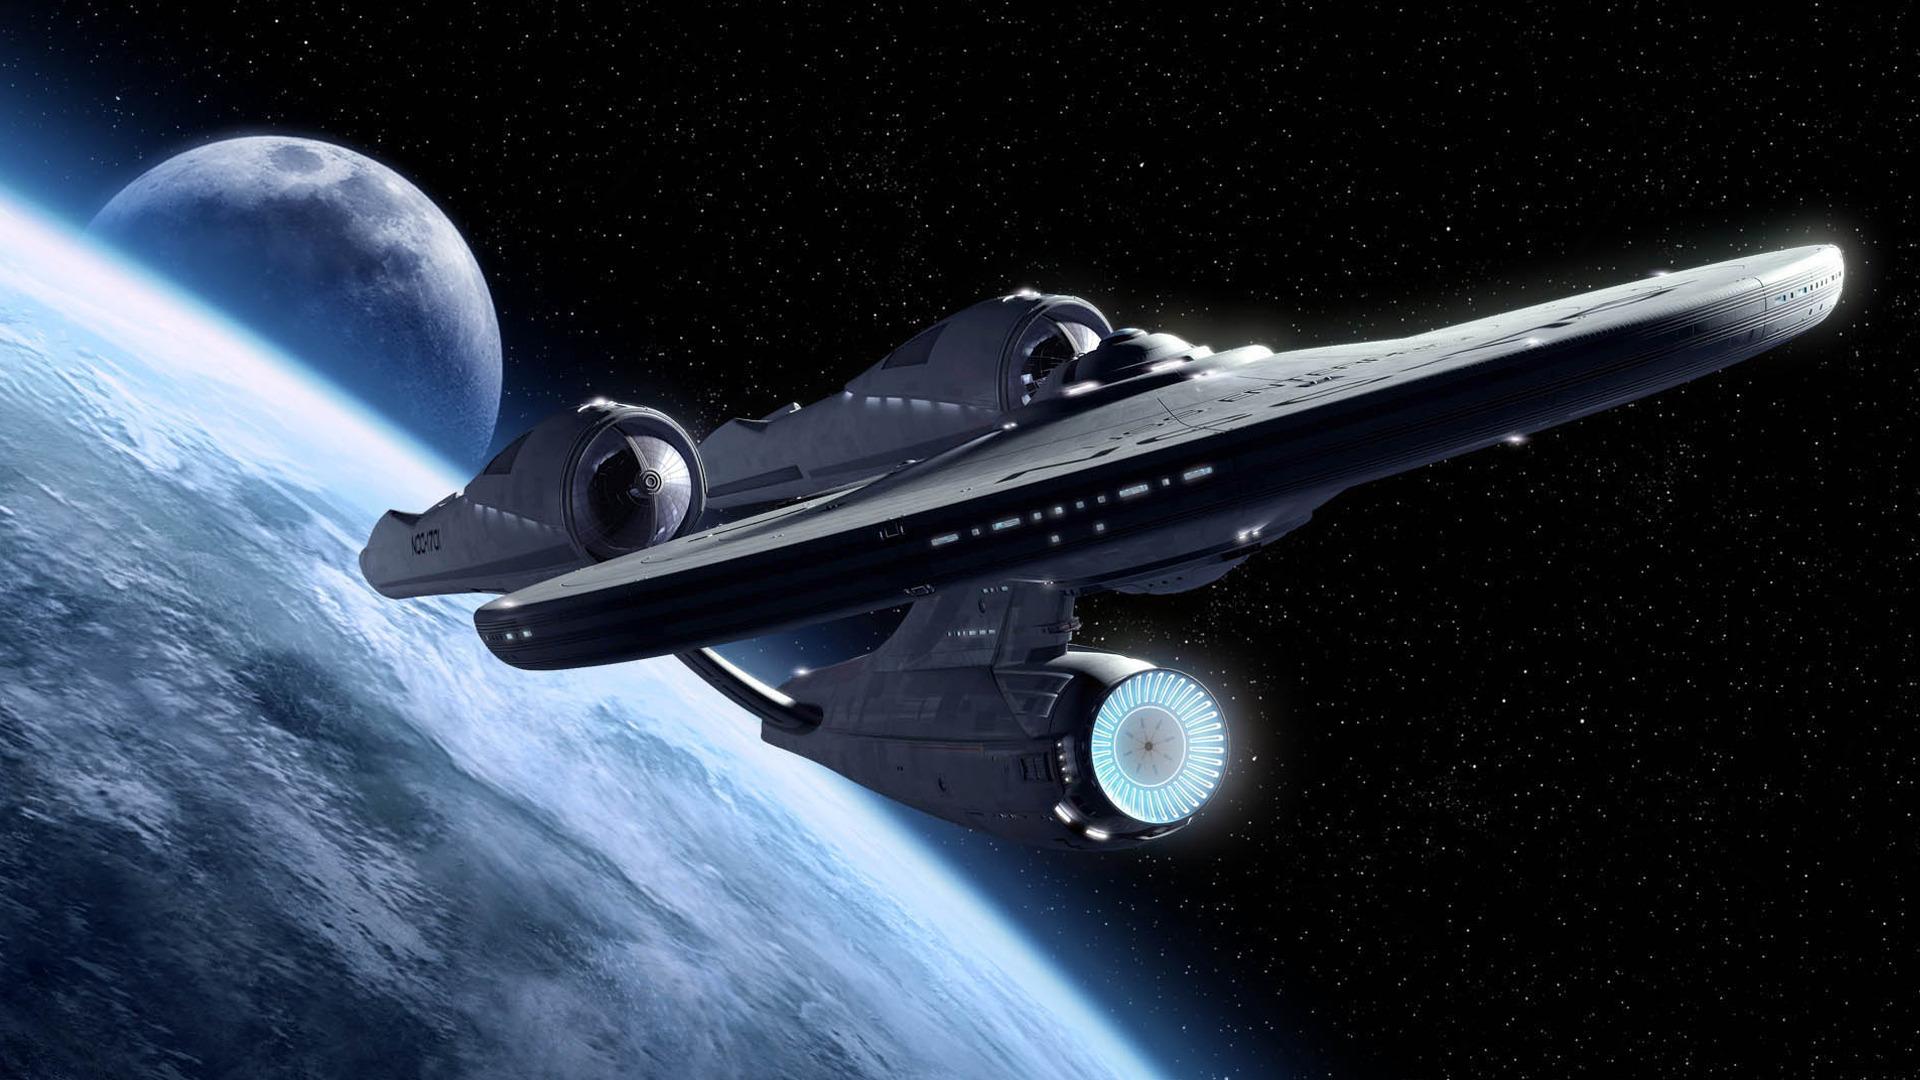 Free Download Star Trek Into Darkness Enterprise Wallpaper Hd